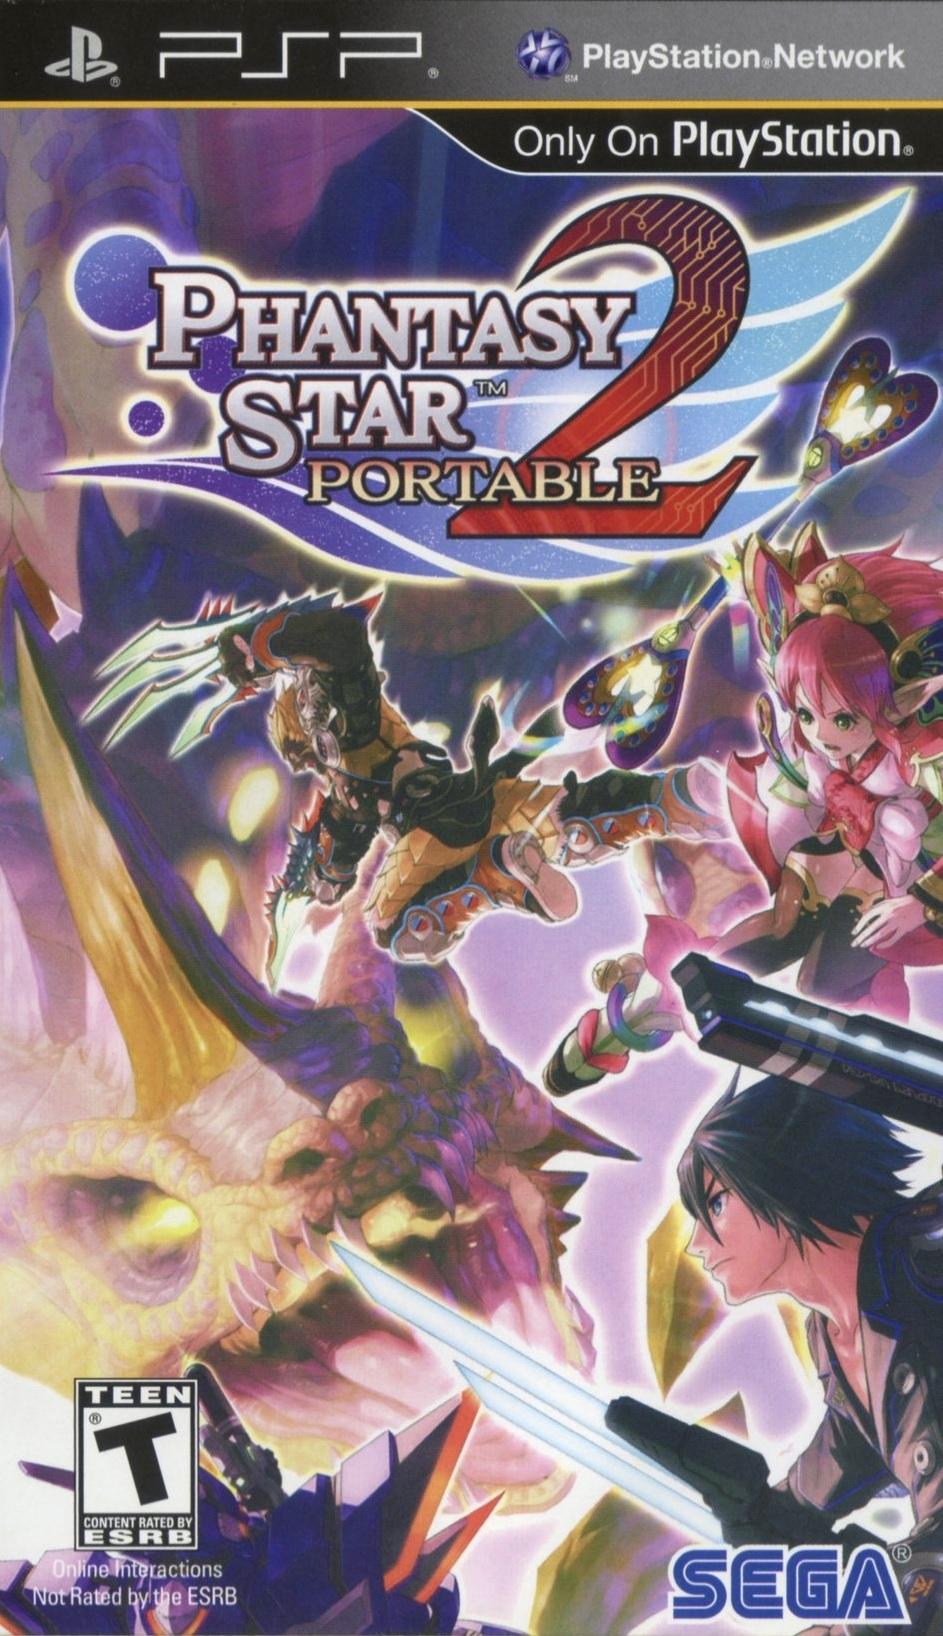 File:Phantasy Star Portable 2 Cover.jpg